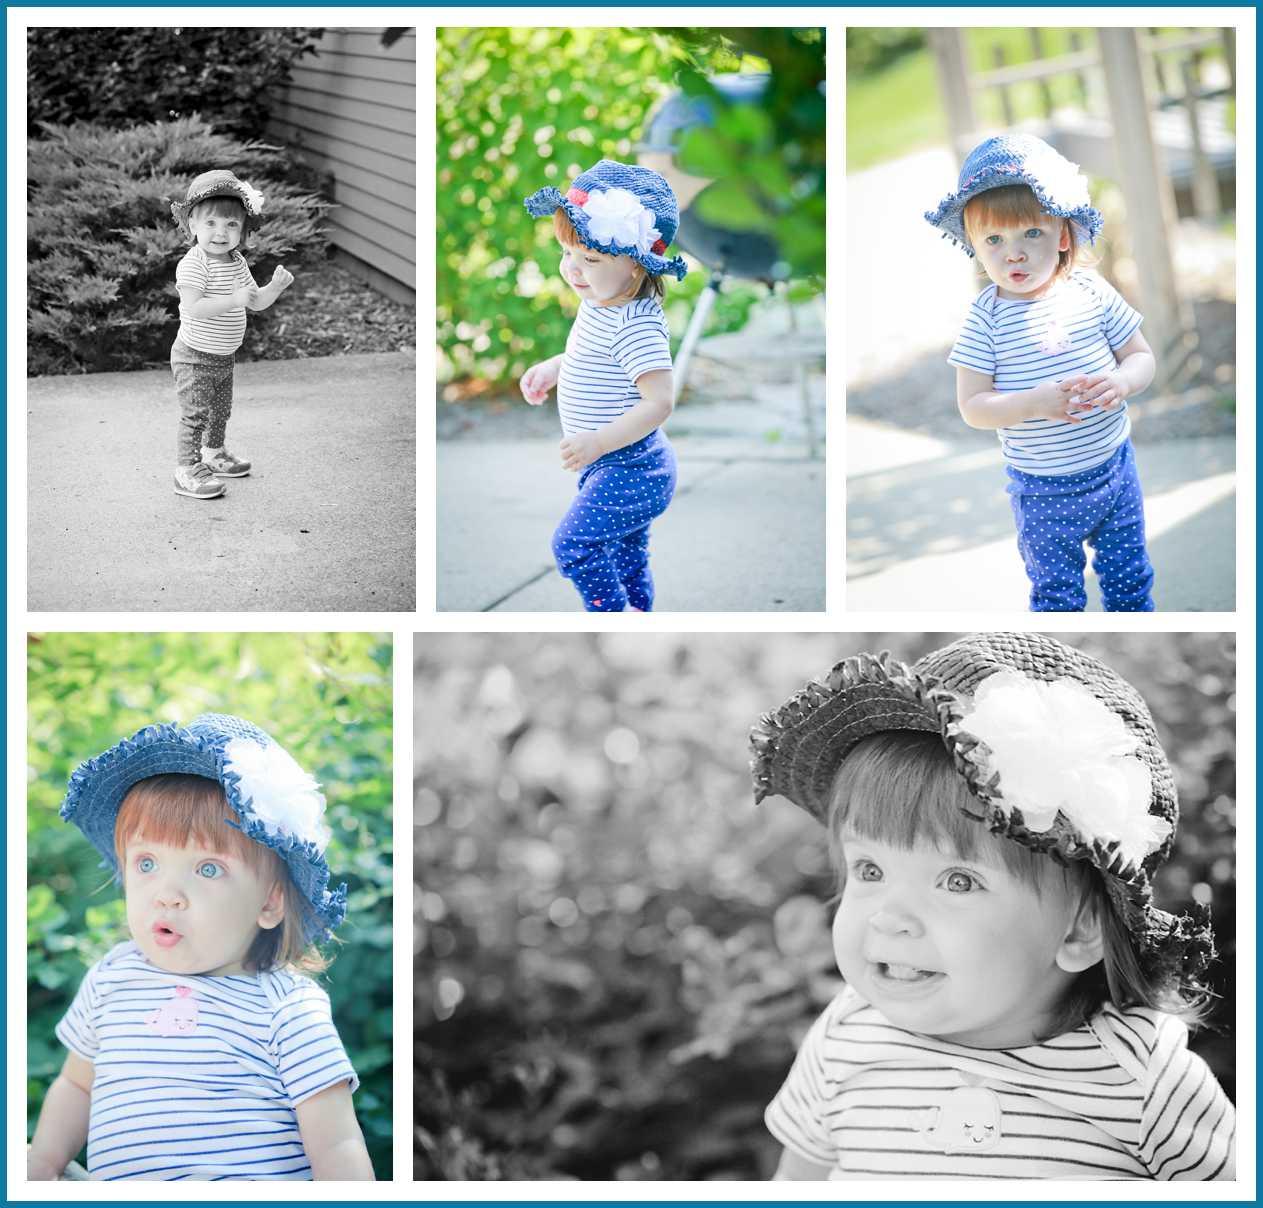 Minneapolis Children's Photographer  Twin Cities Kids Photographer  18 month photo shoot minneapolis